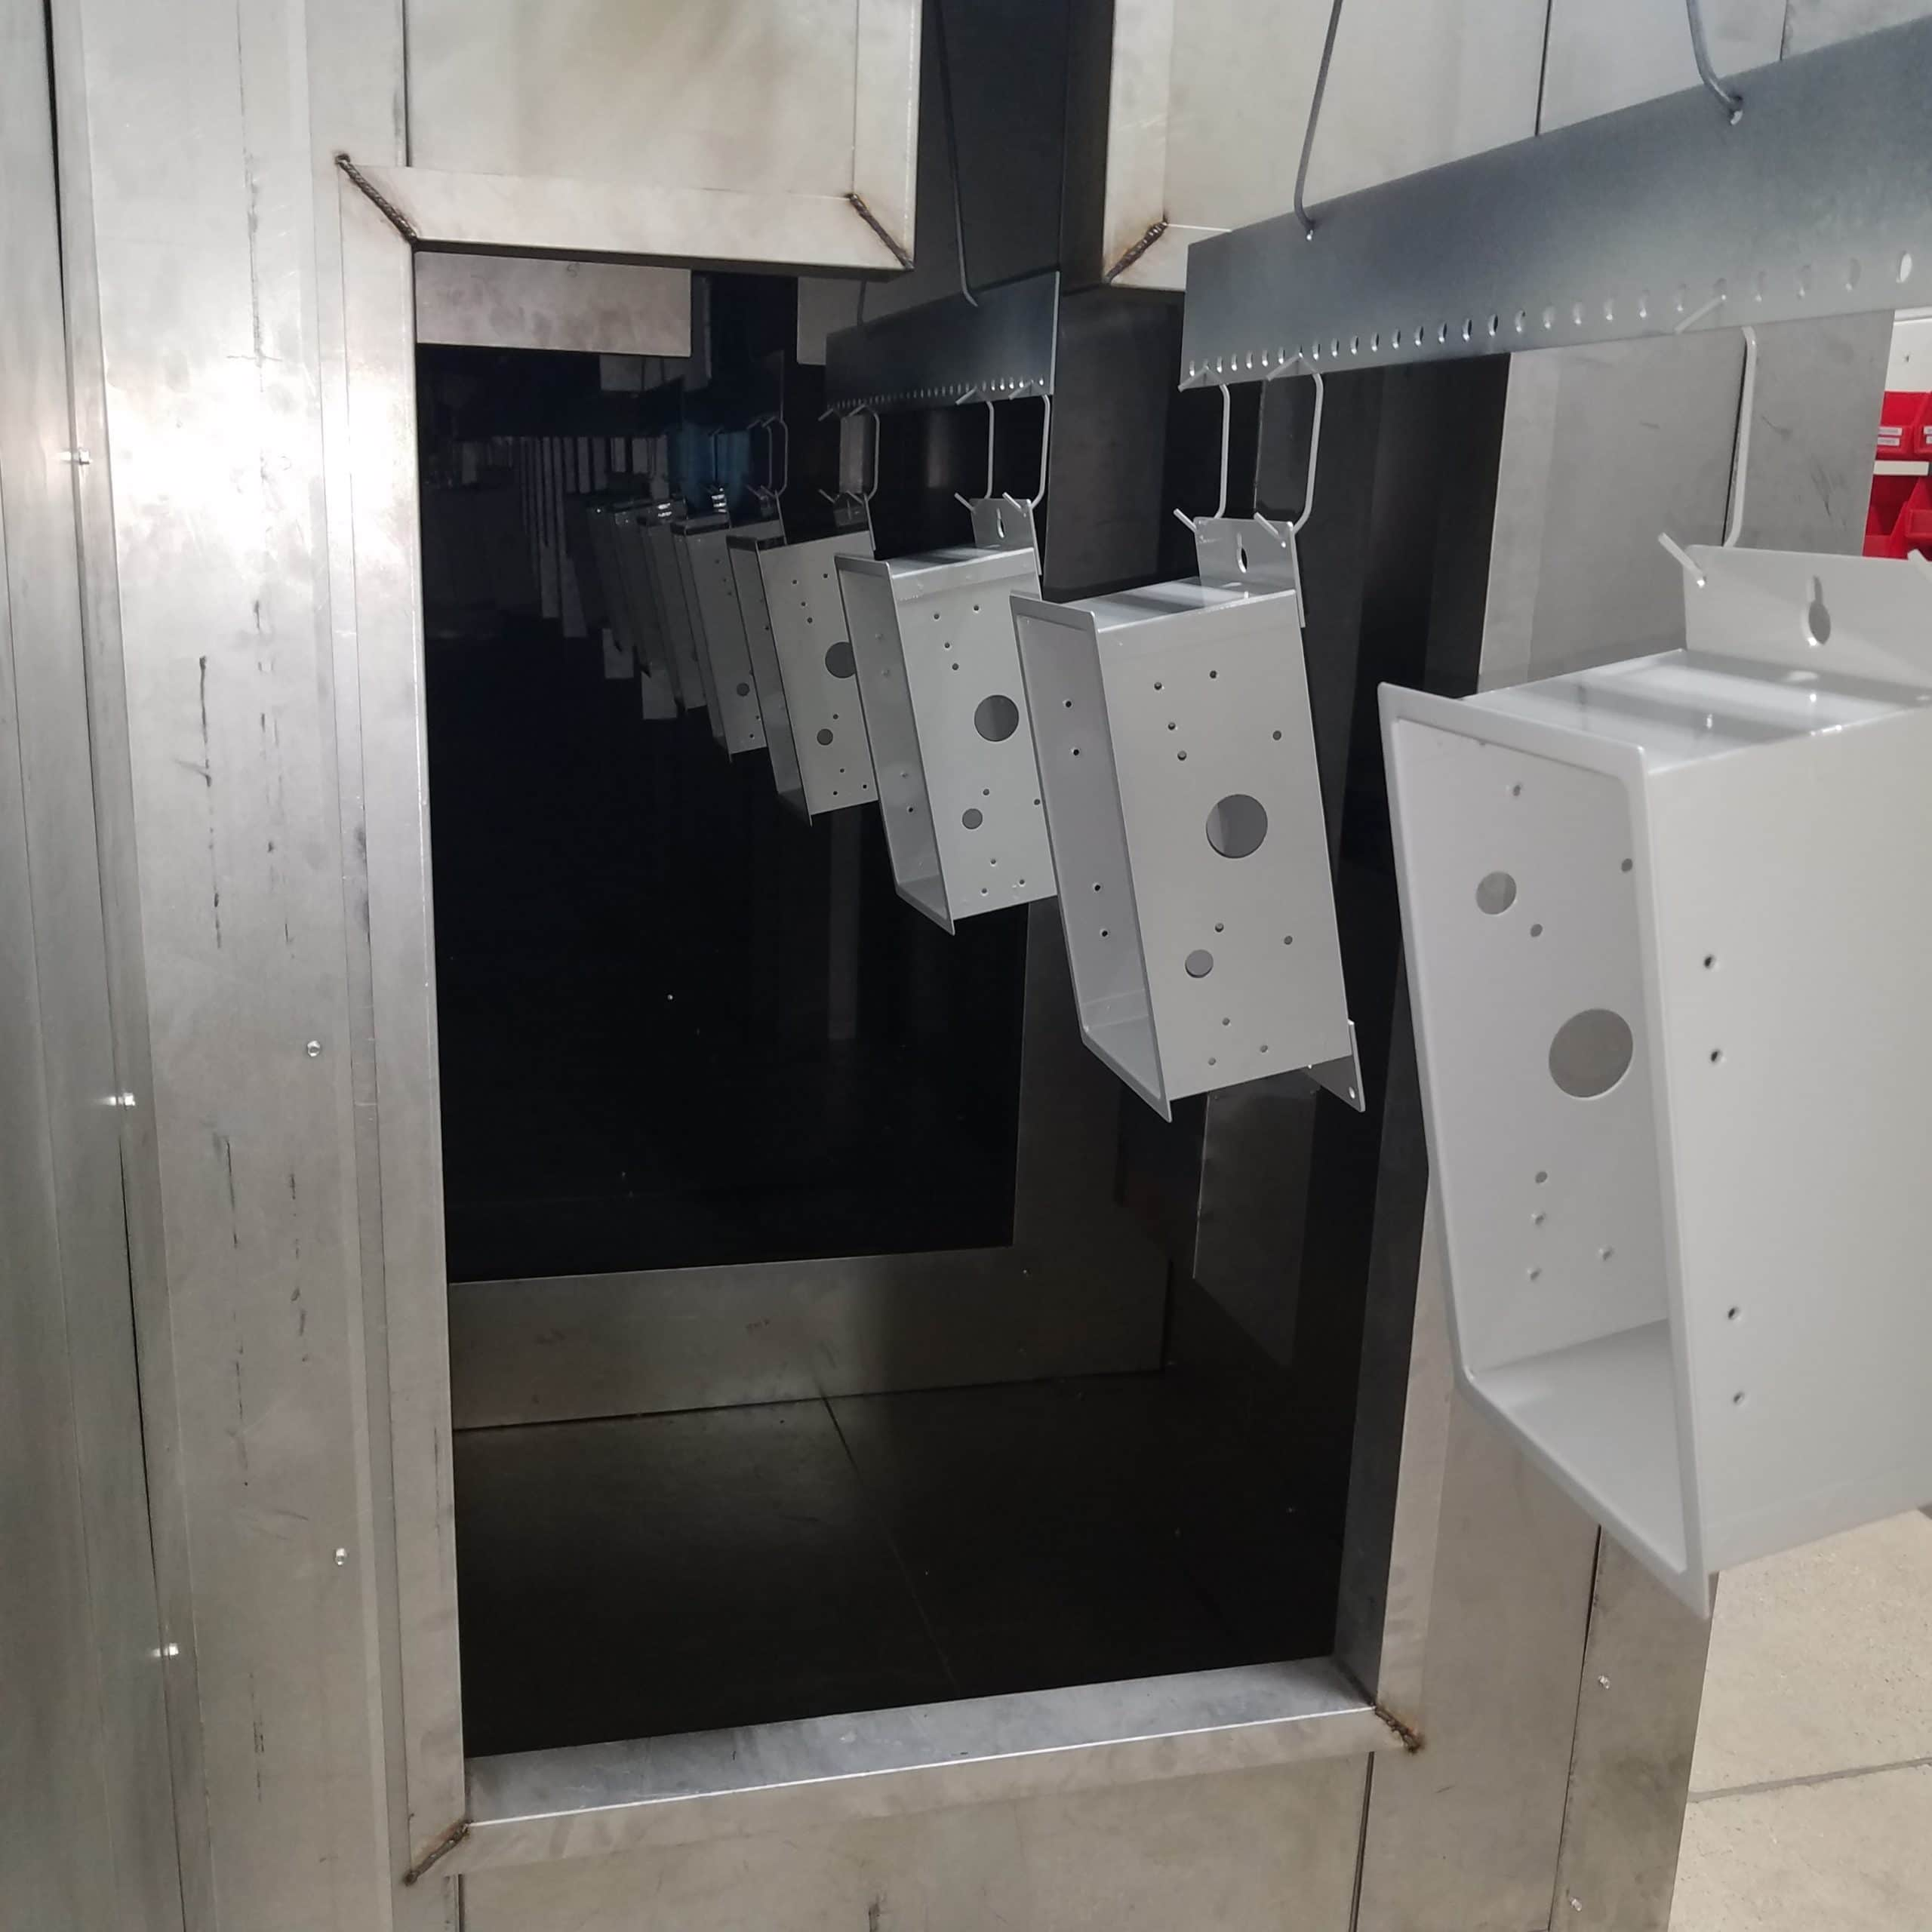 Powder Coating - Automated drying